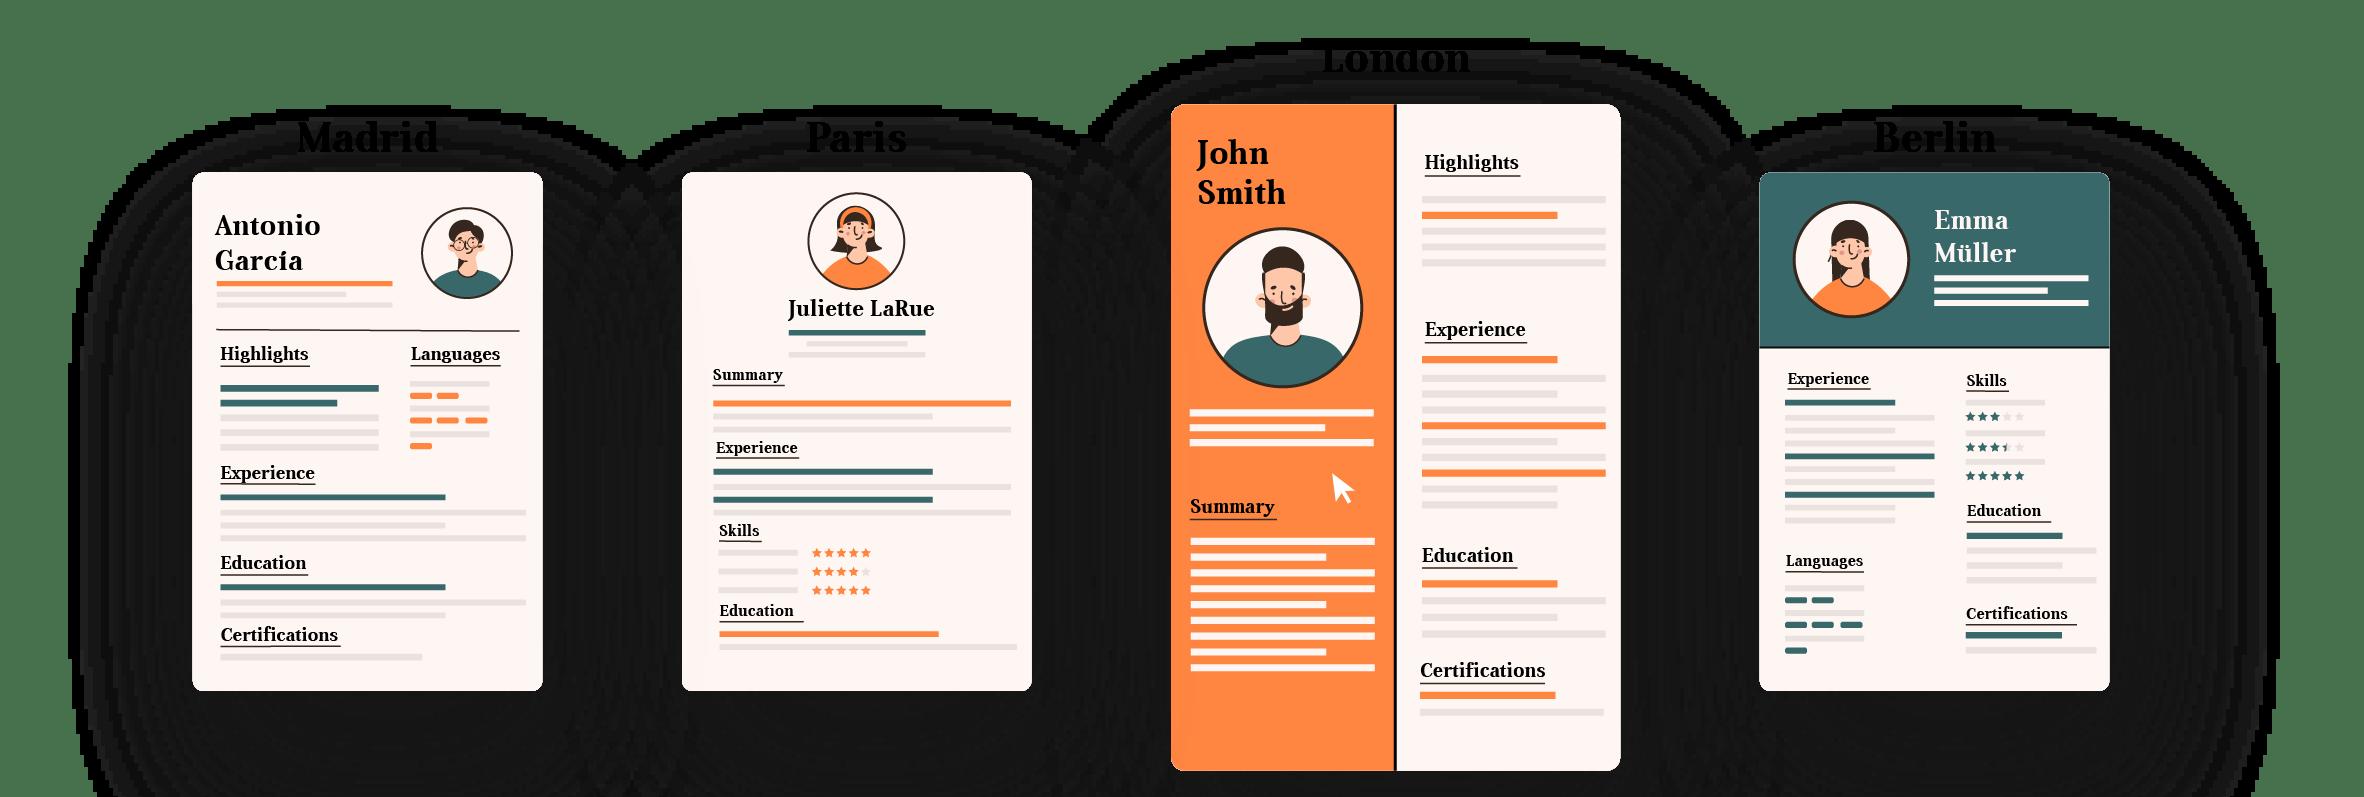 resume select